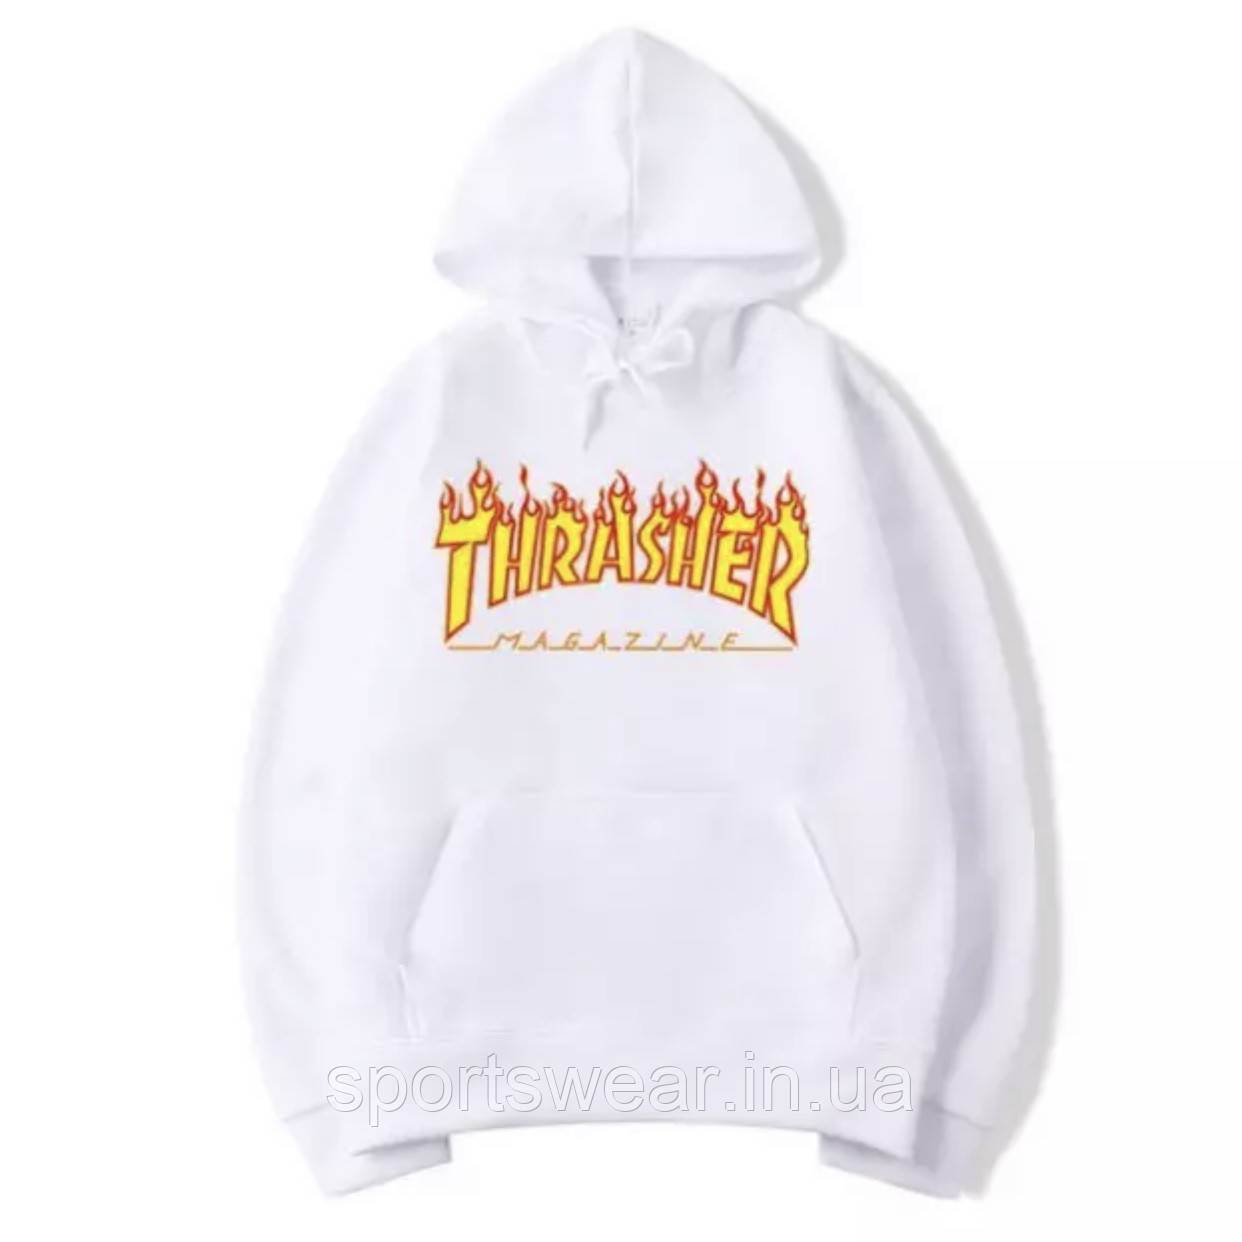 Худи Thrasher Flame белое с логотипом, унисекс